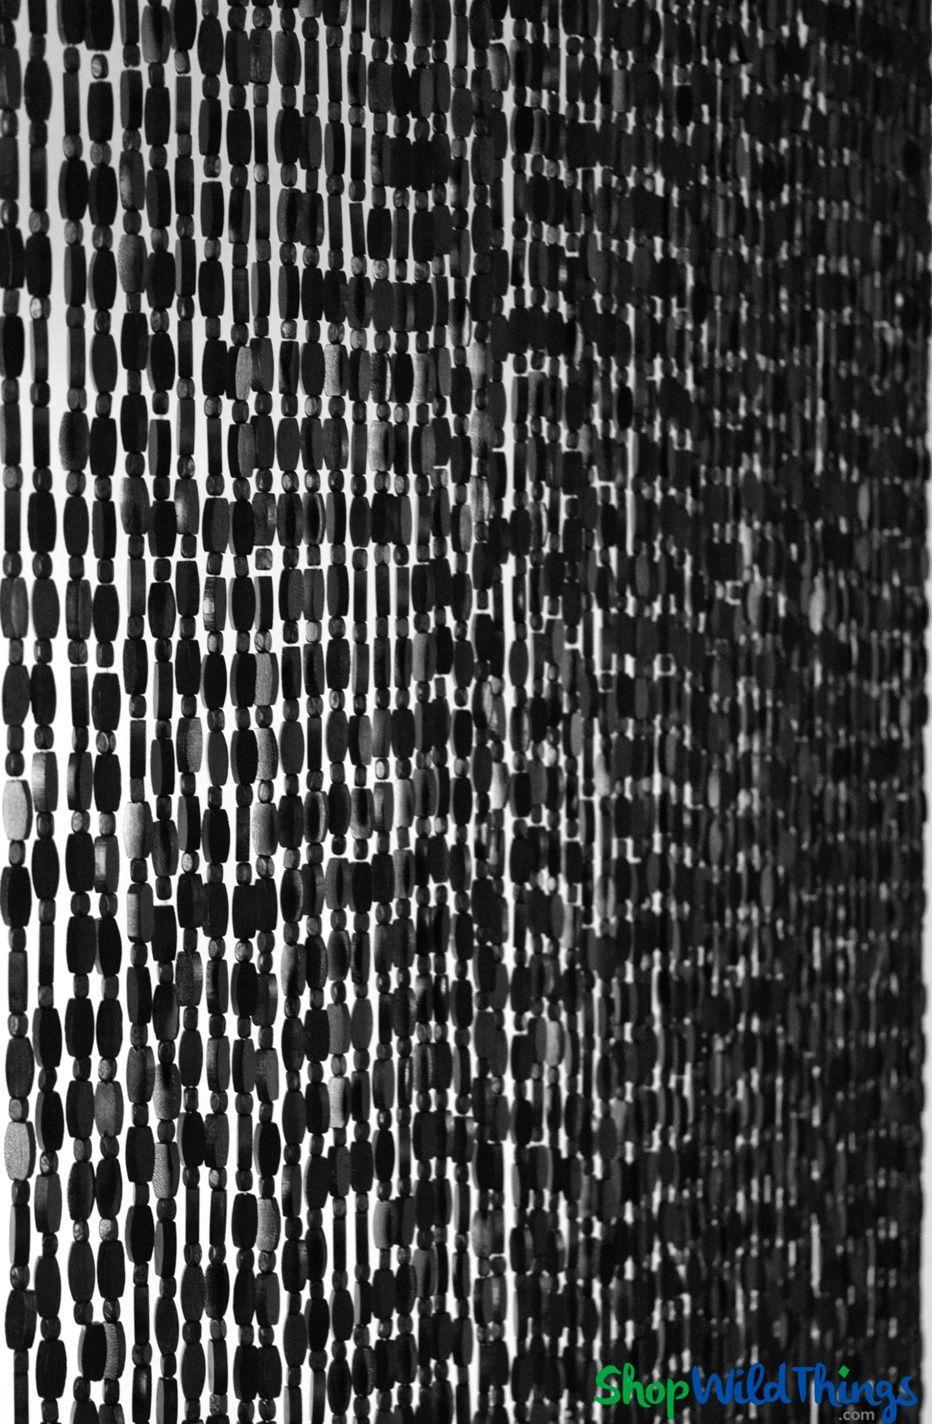 Wooden Bead Curtain Ashford Black 35 1 2 X 77 52 Strands